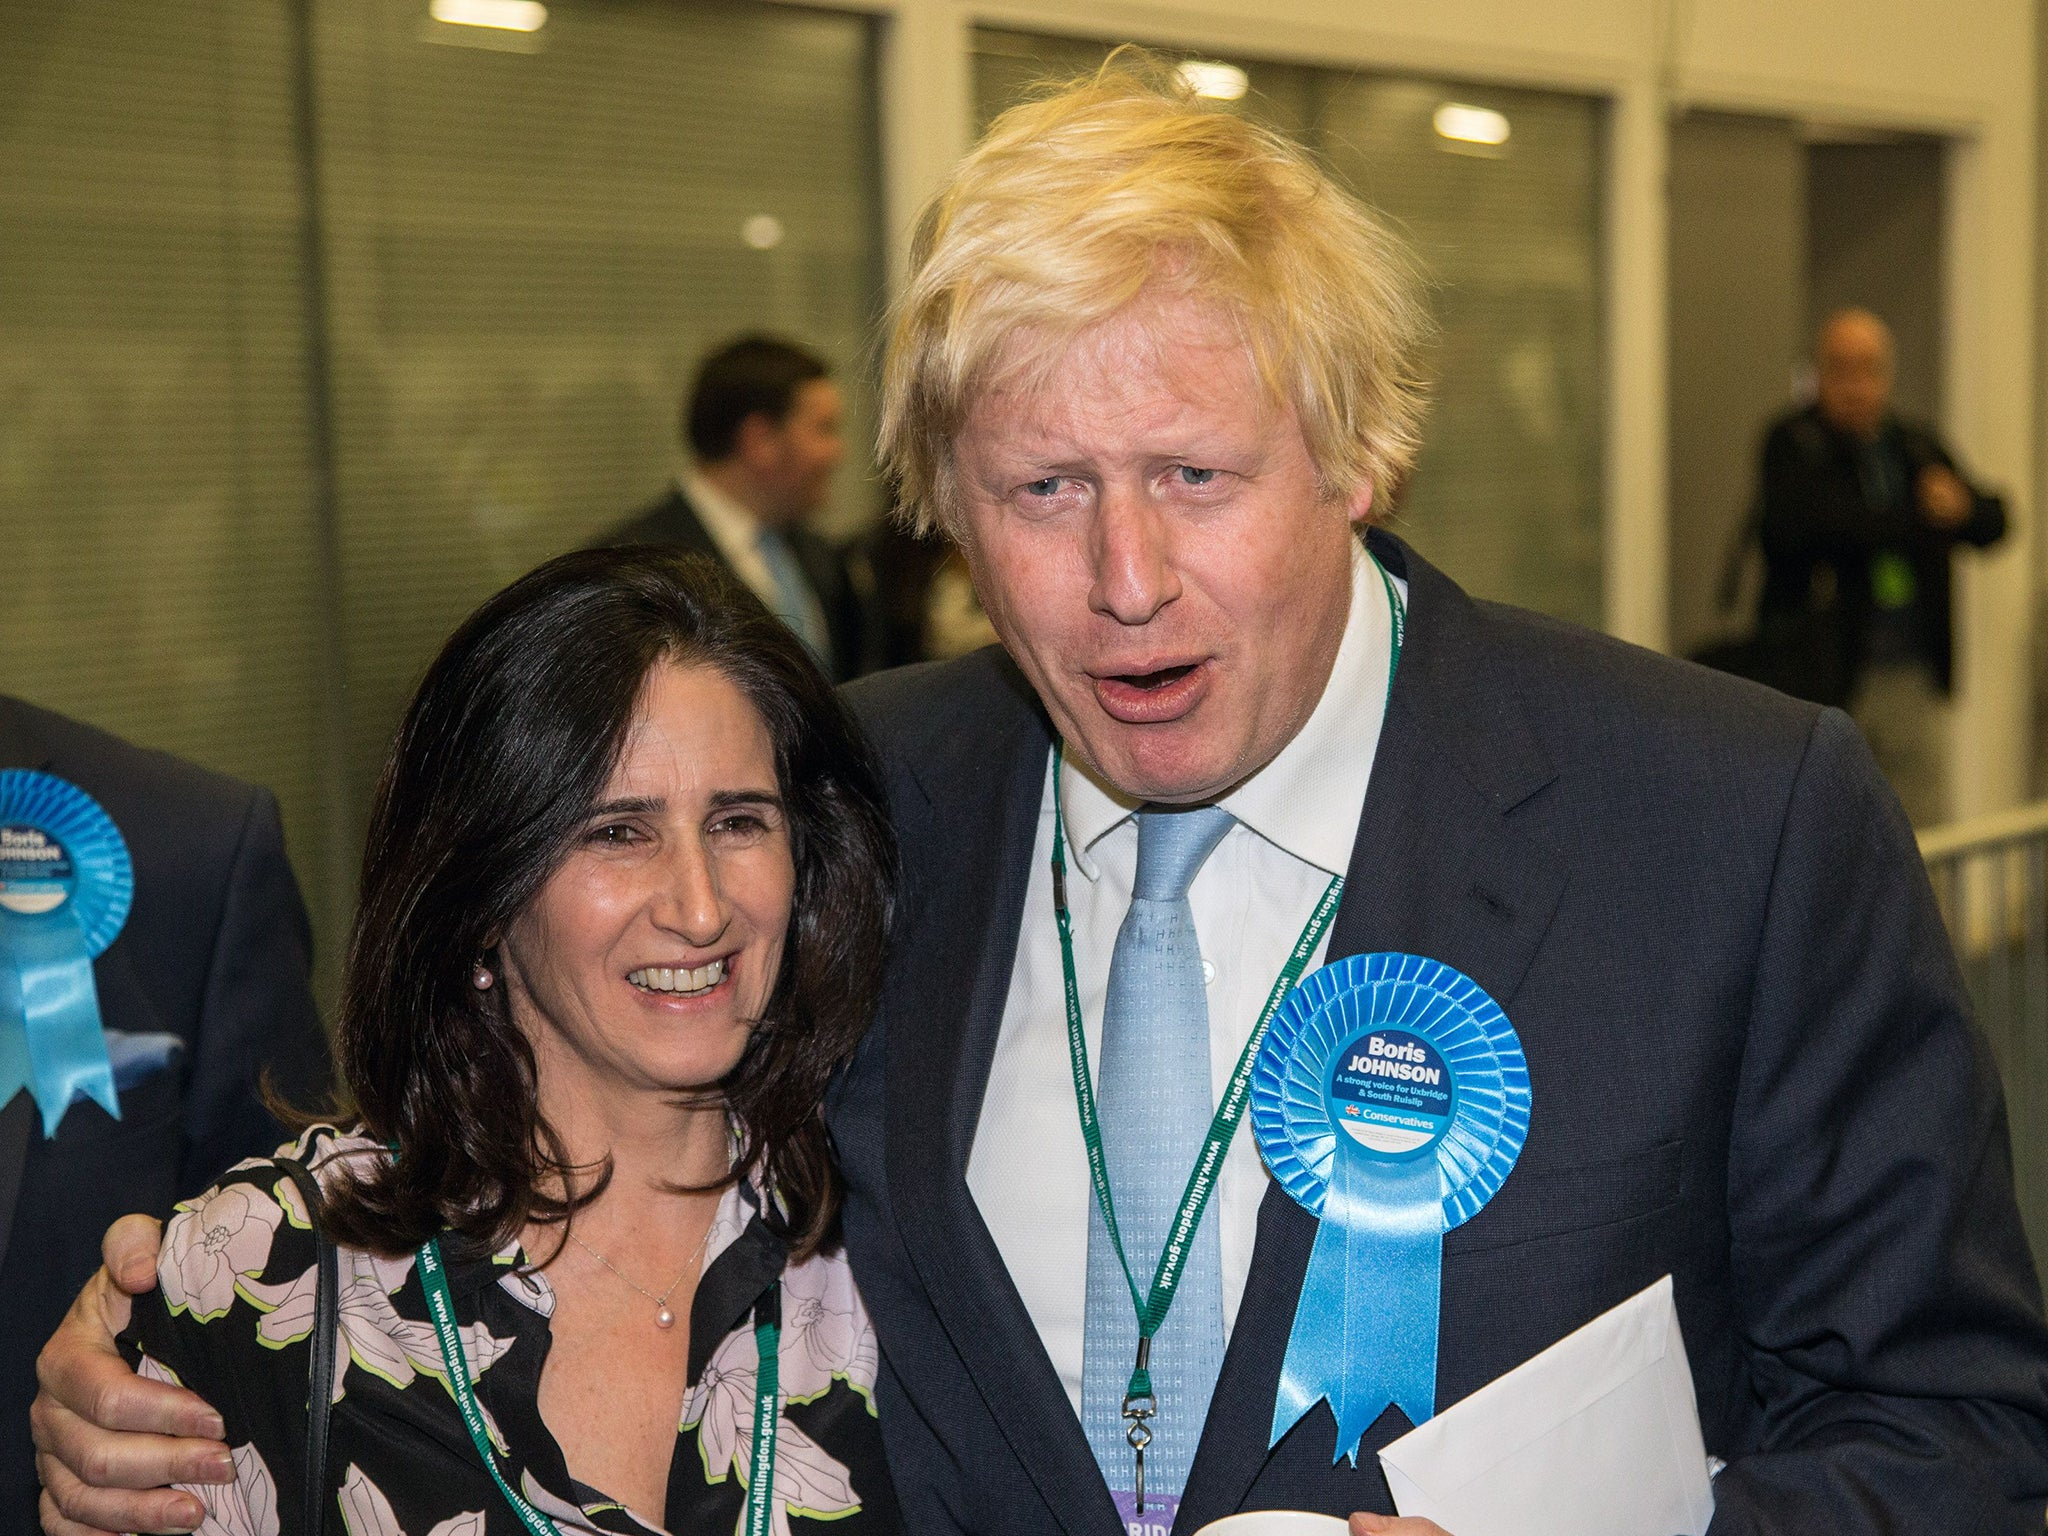 The personal life of Boris April 2